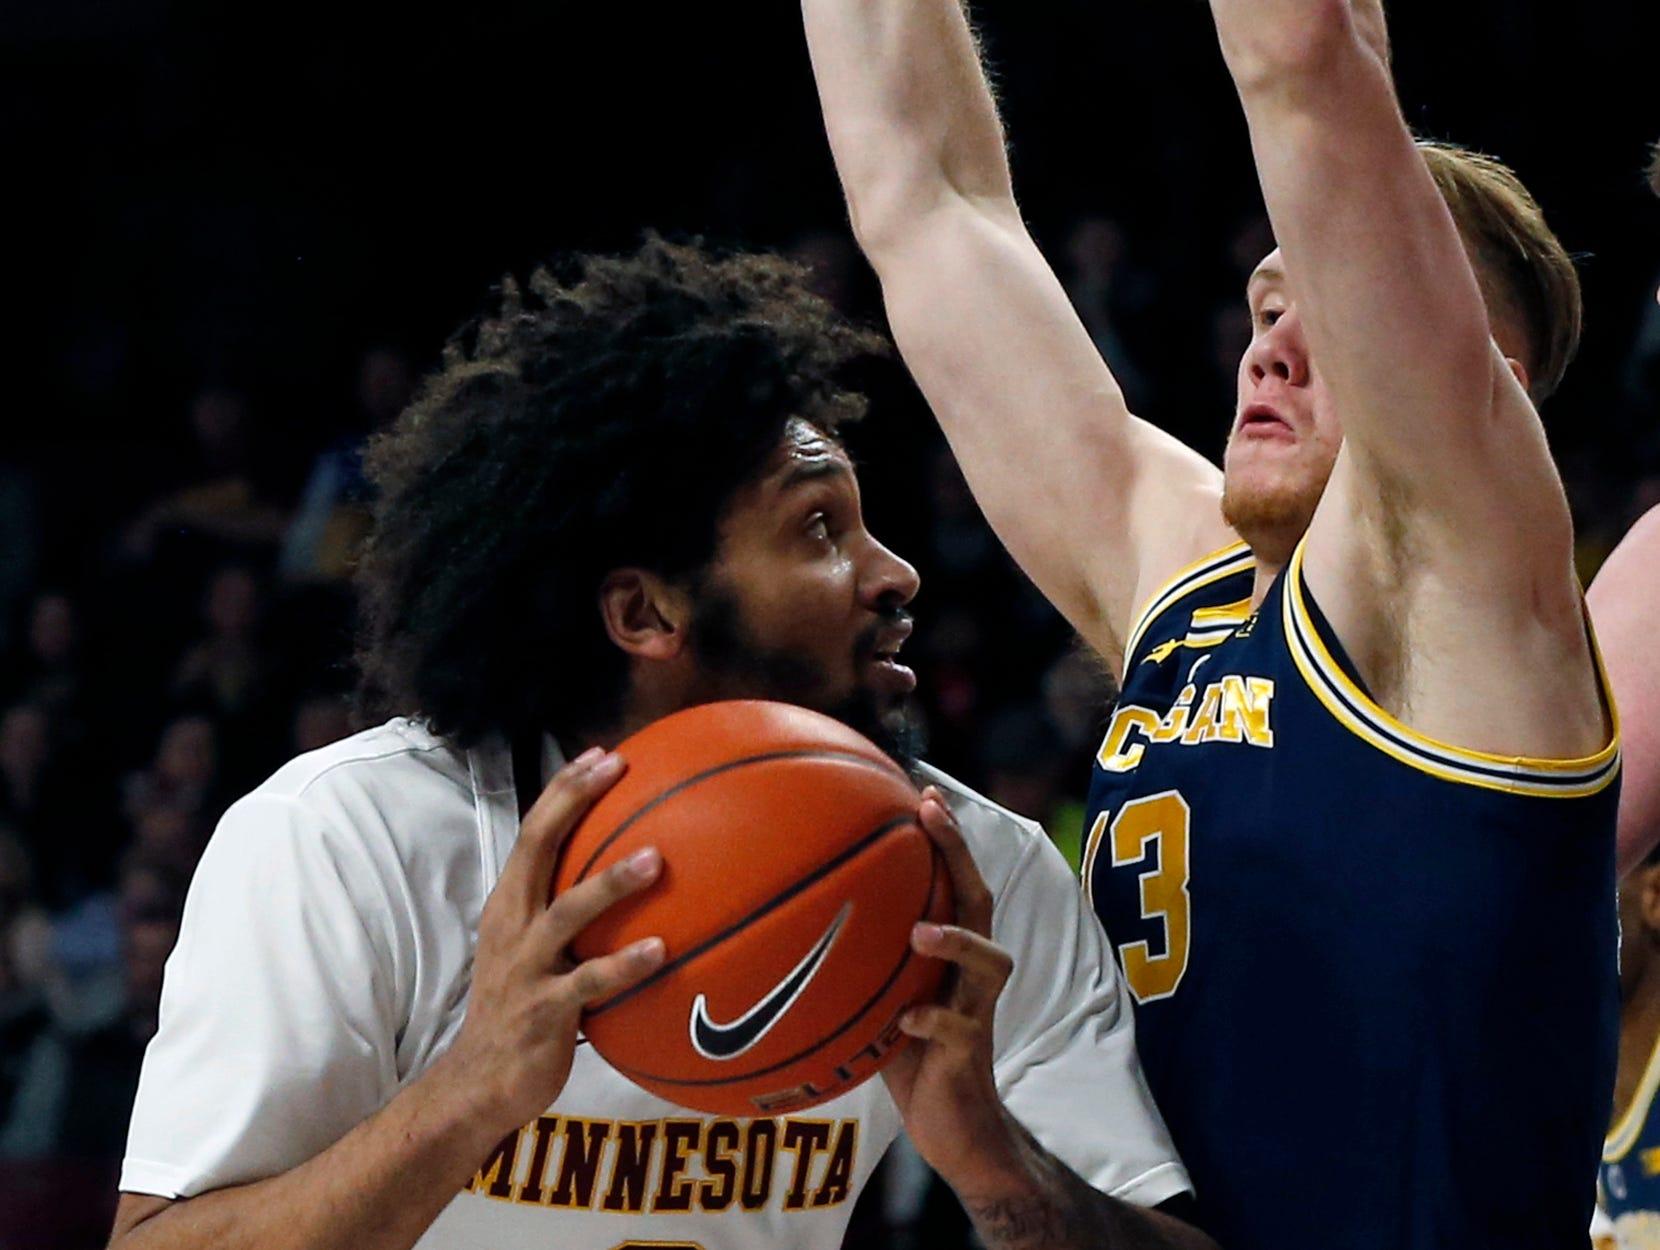 Minnesota's Jordan Murphy, left, tries to get around Michigan's Ignas Brazdeikis in the first half.